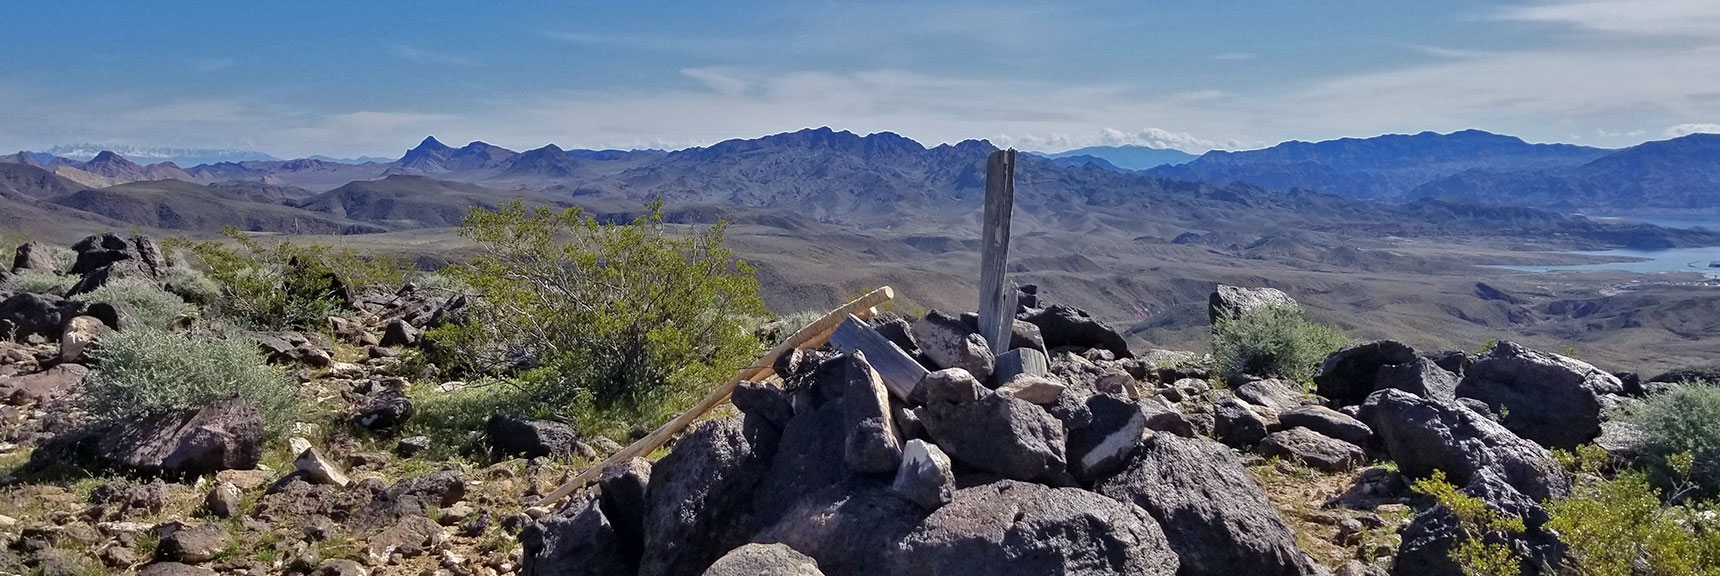 View Toward Jimbilnan Wilderness from Black Mesa in Lake Mead National Recreation Area, Nevada